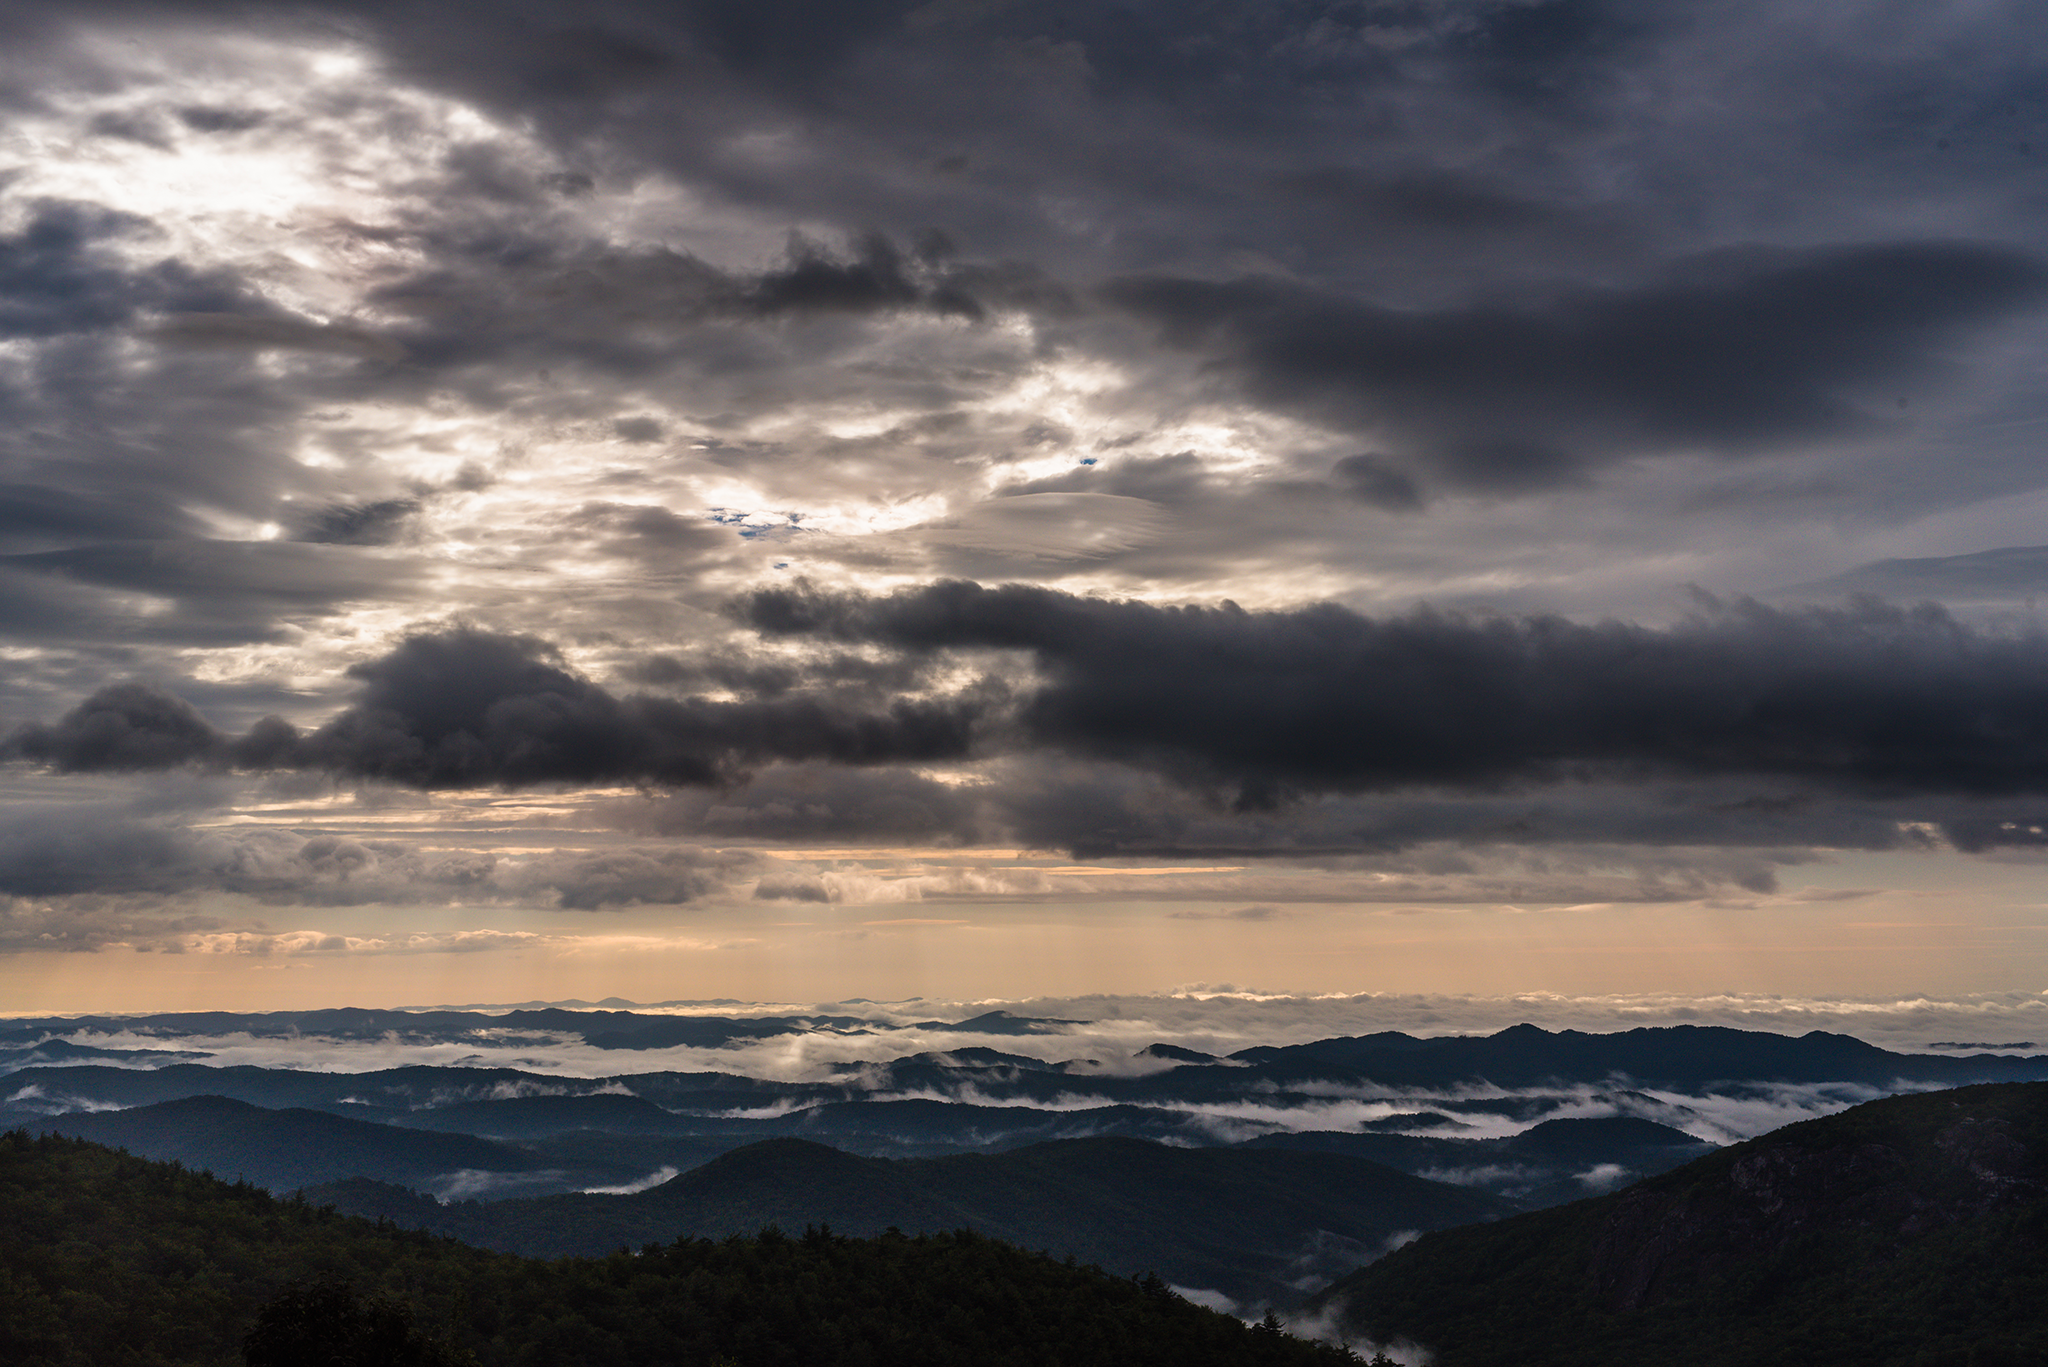 Blue ridge Mountain Storm - Cottrell & Co. Photographers.png